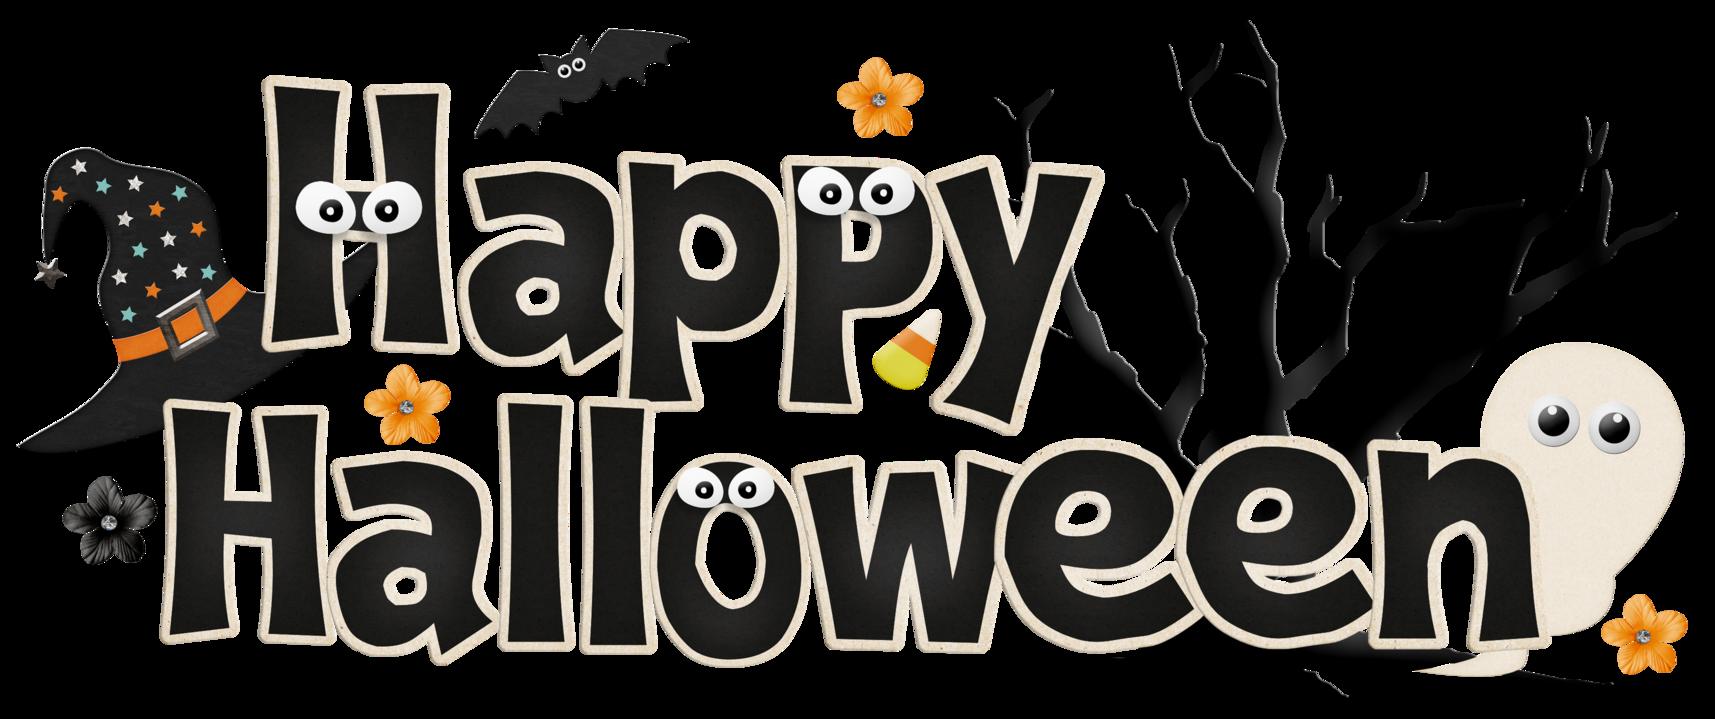 funny-happy-halloween-clip-art-clipart-free-clipart-gvTVKI-clipart